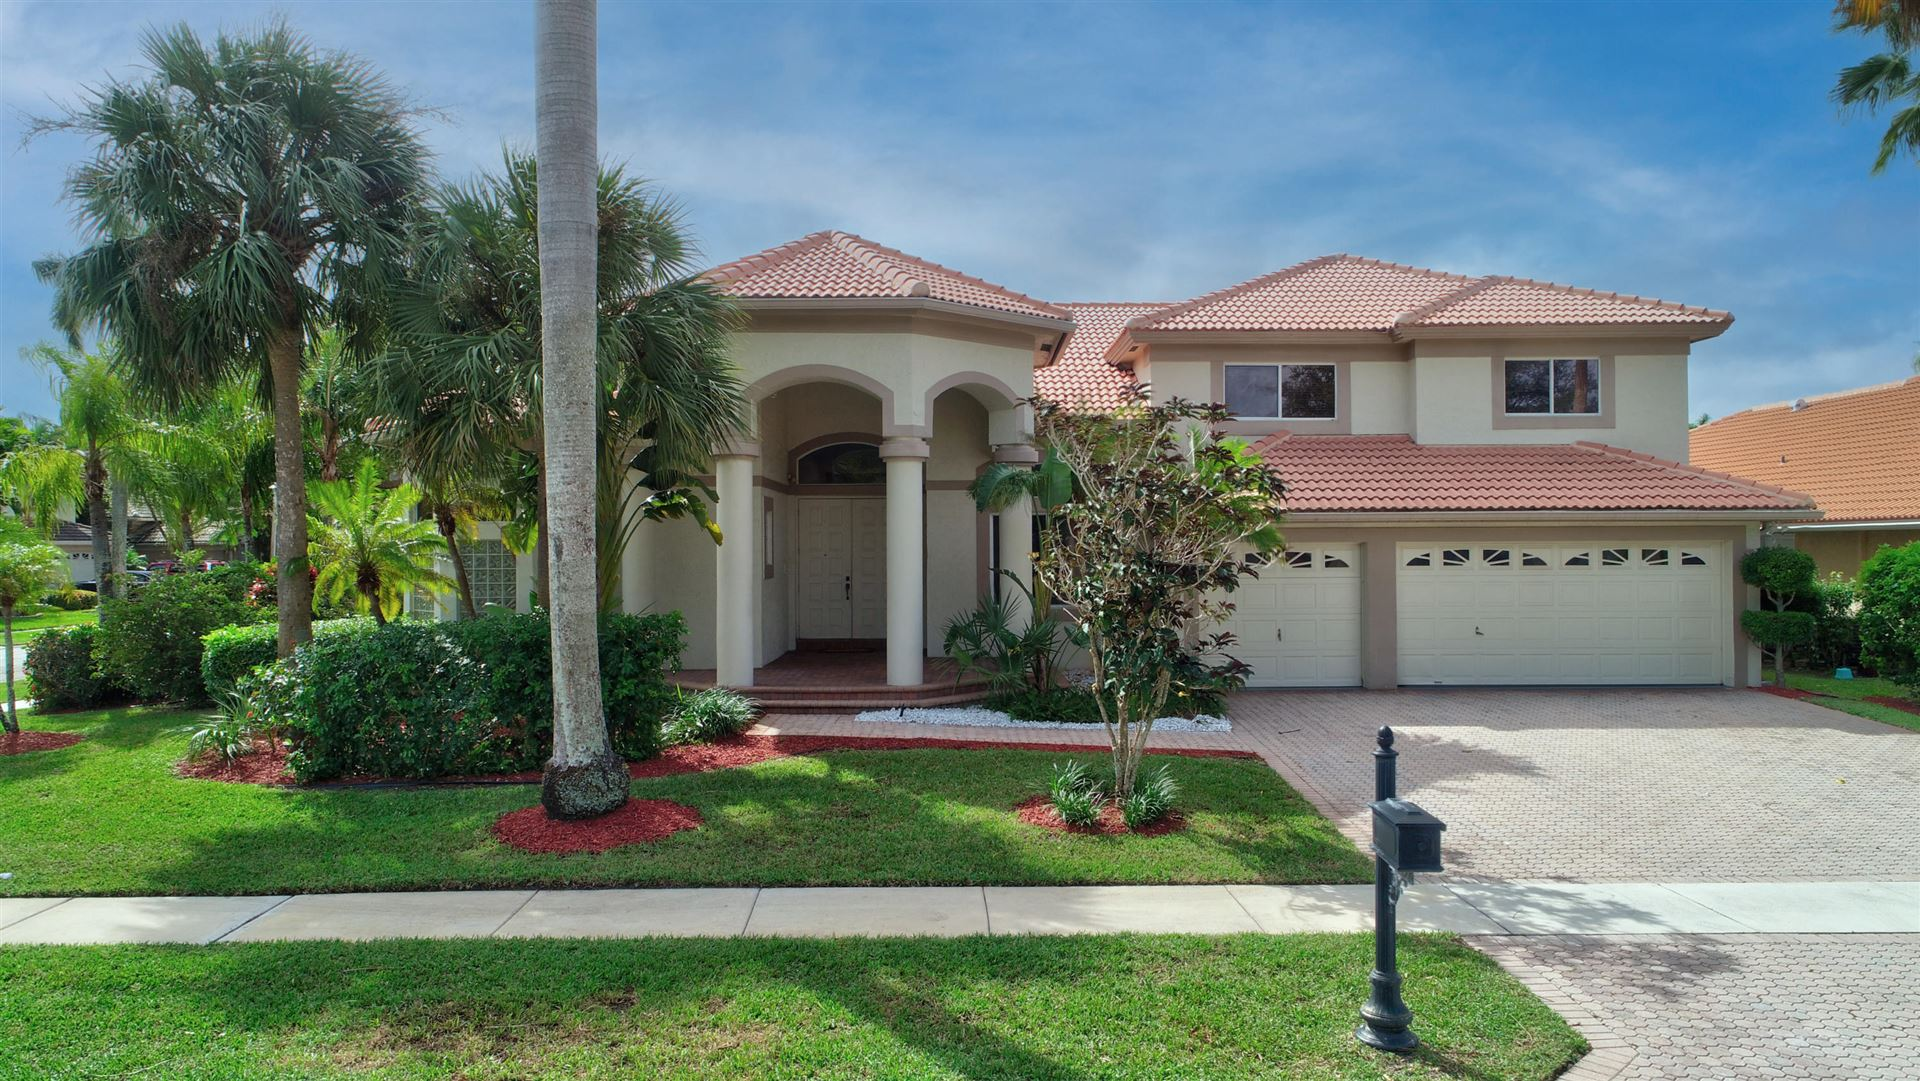 20297 Ocean Key Drive, Boca Raton, FL 33498 - #: RX-10673808